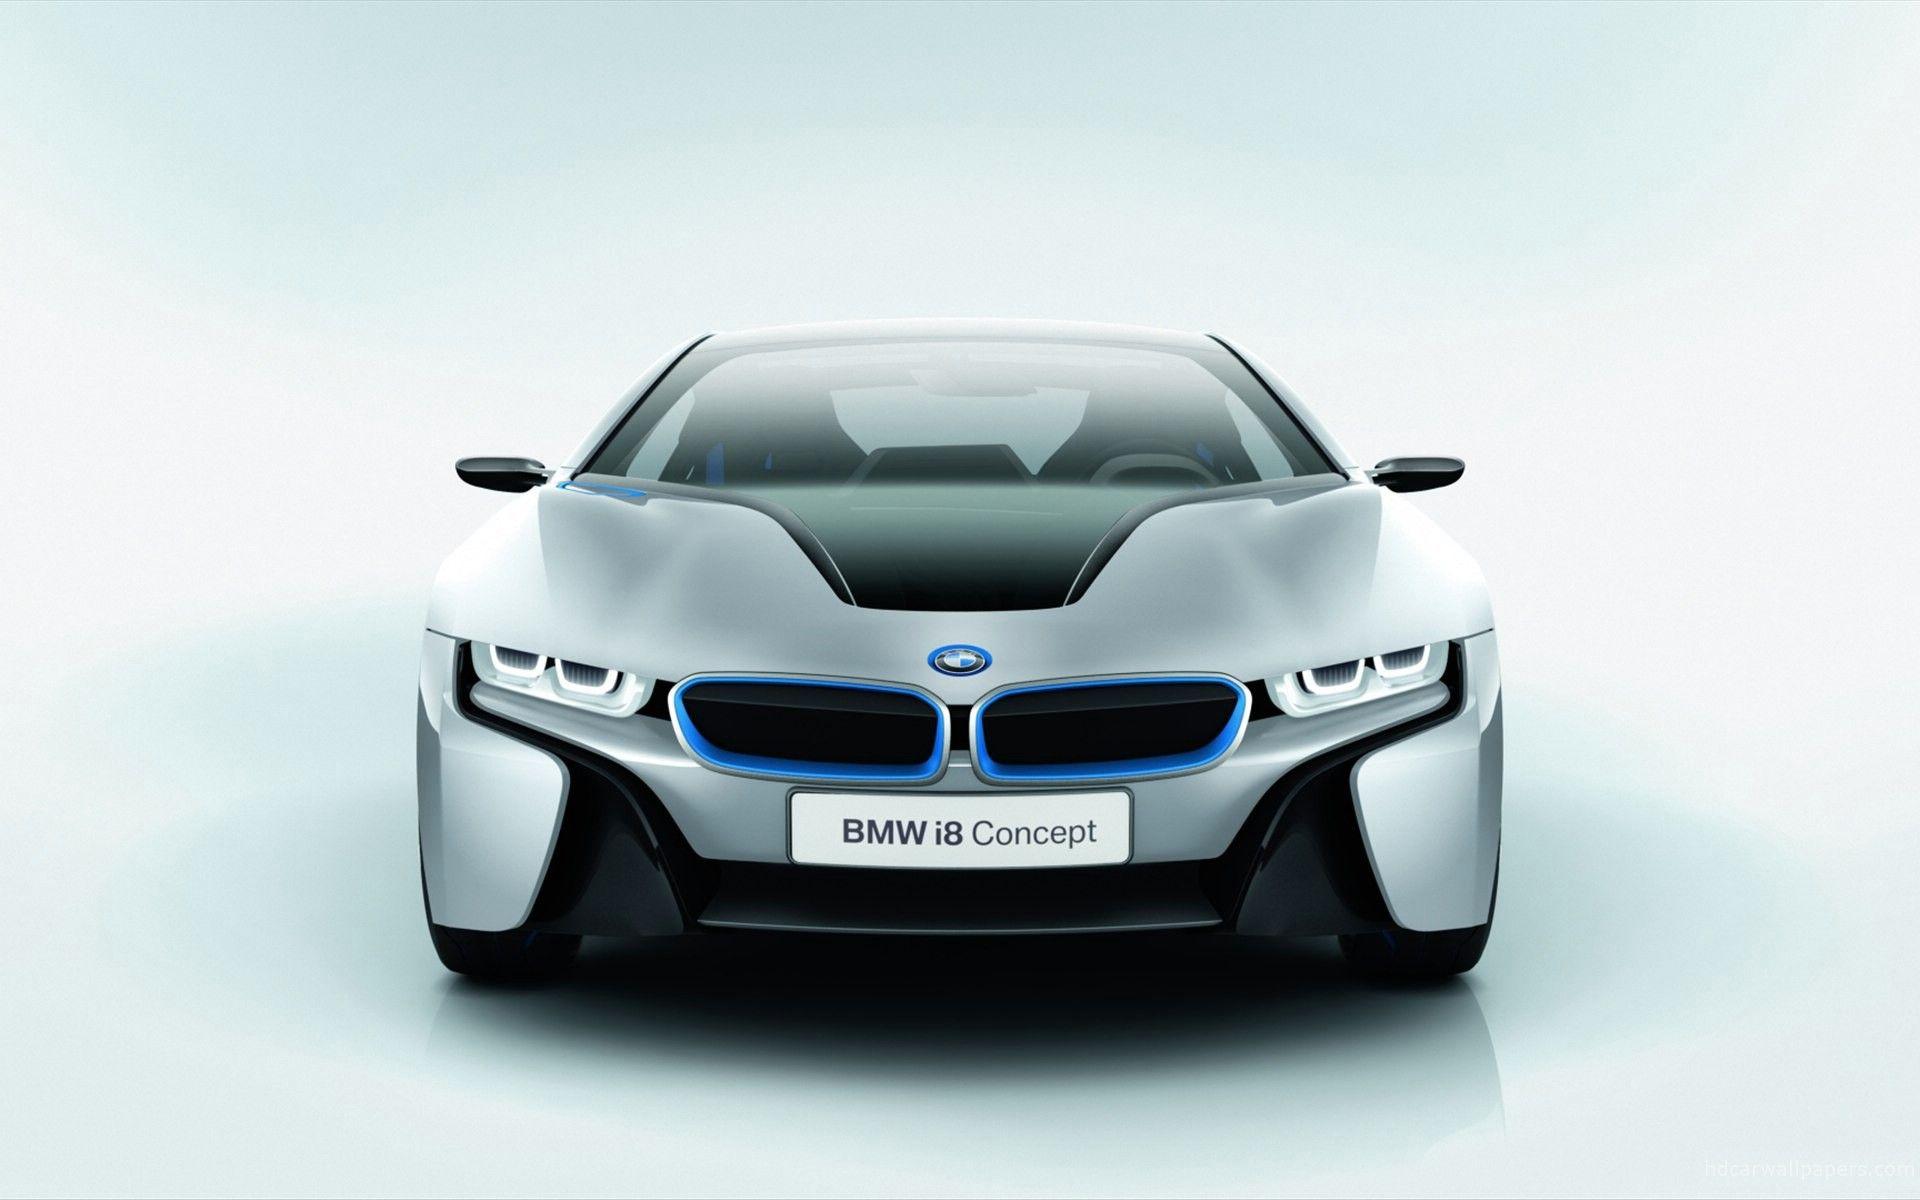 Bmw i8 concept the most progressive sportscar bmw i born electric inside interior look concept supercars pinterest bmw i8 bmw and super car